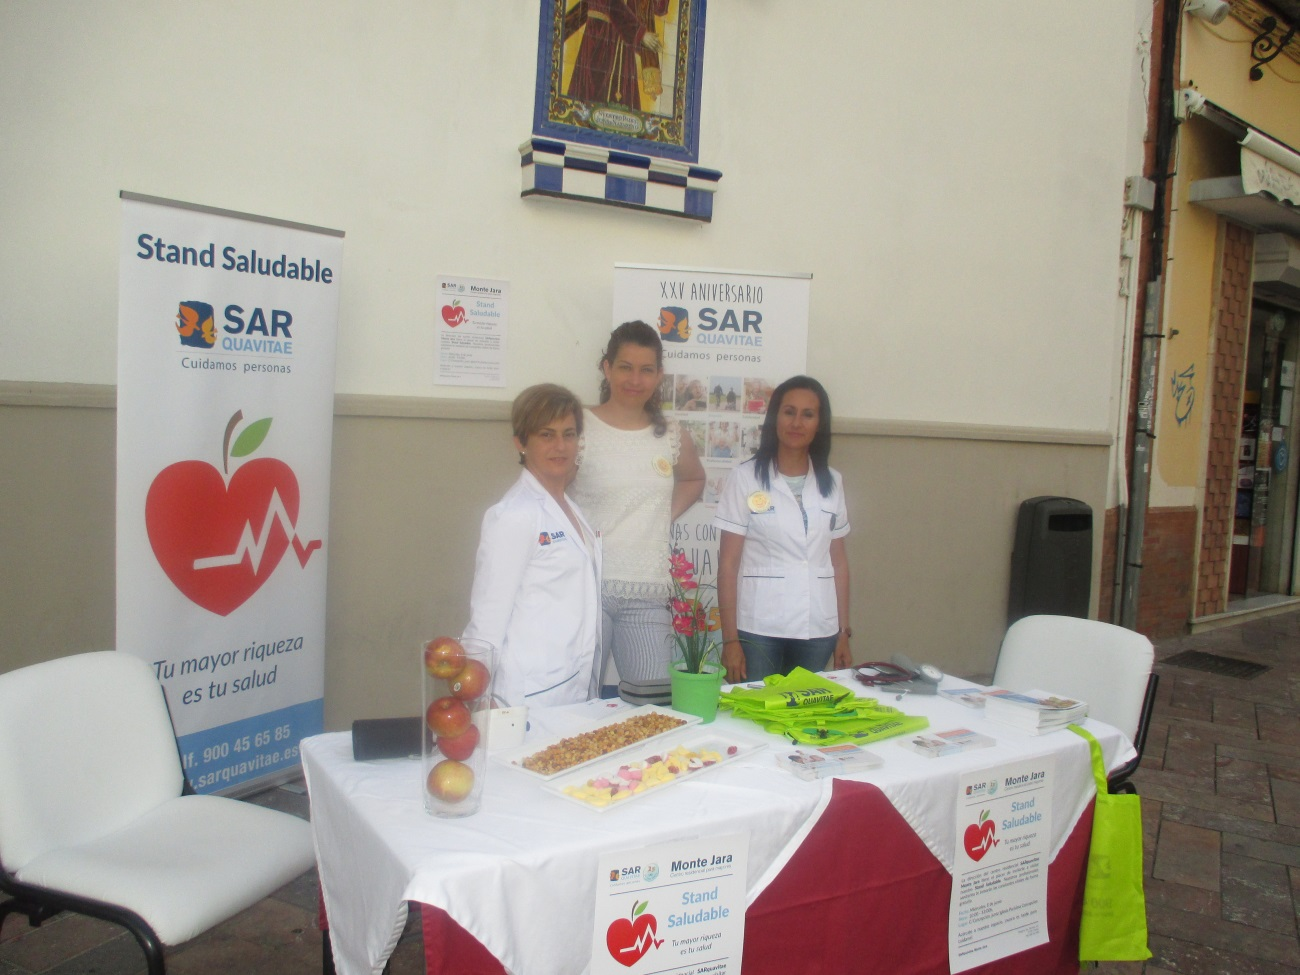 Monte Jara Stand saludable3